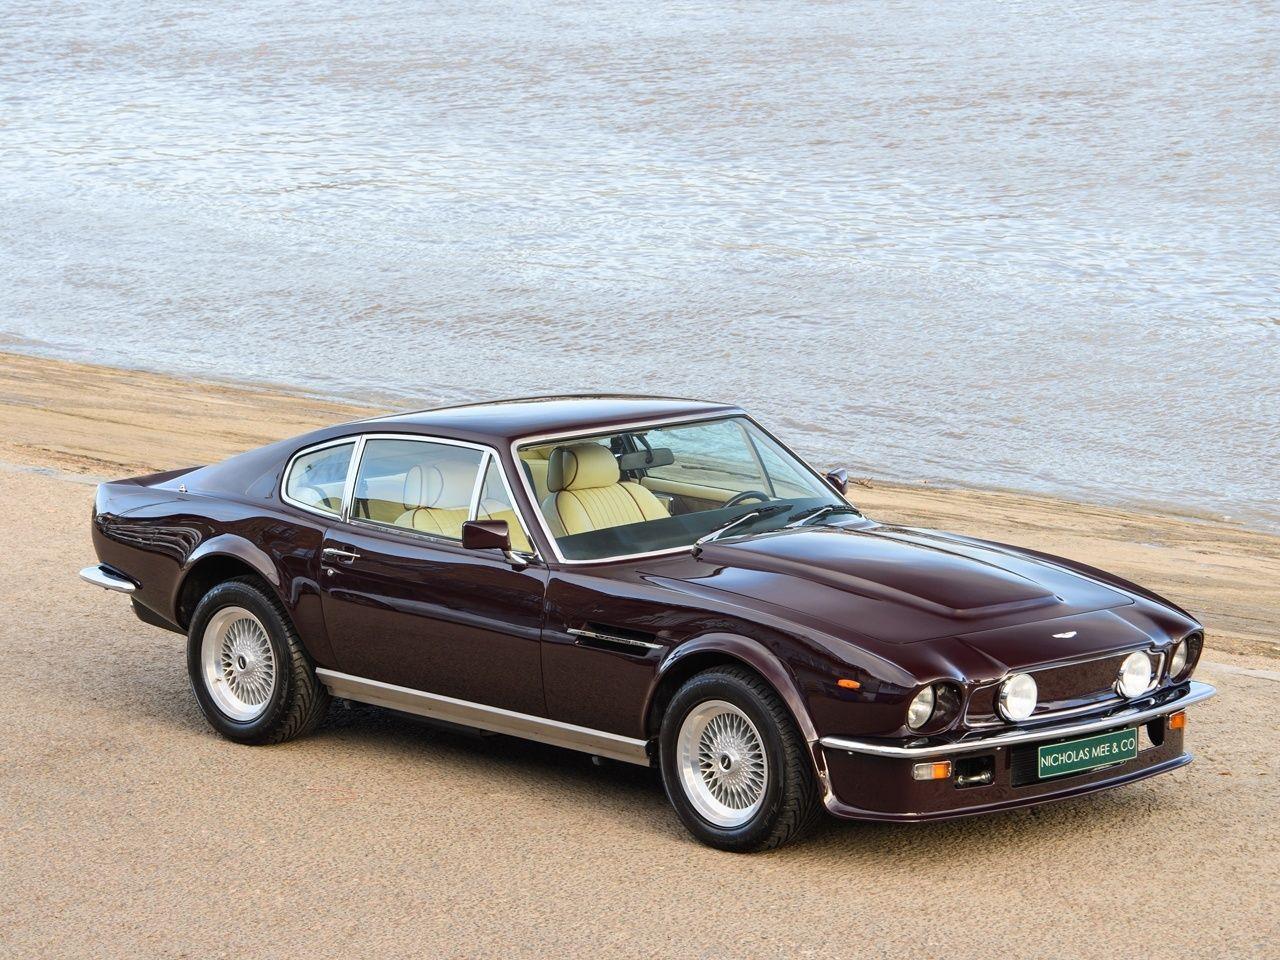 1984 Aston Martin V8 Vantage Lhd Classic Driver Market Aston Martin Luxury Cars Aston Martin For Sale